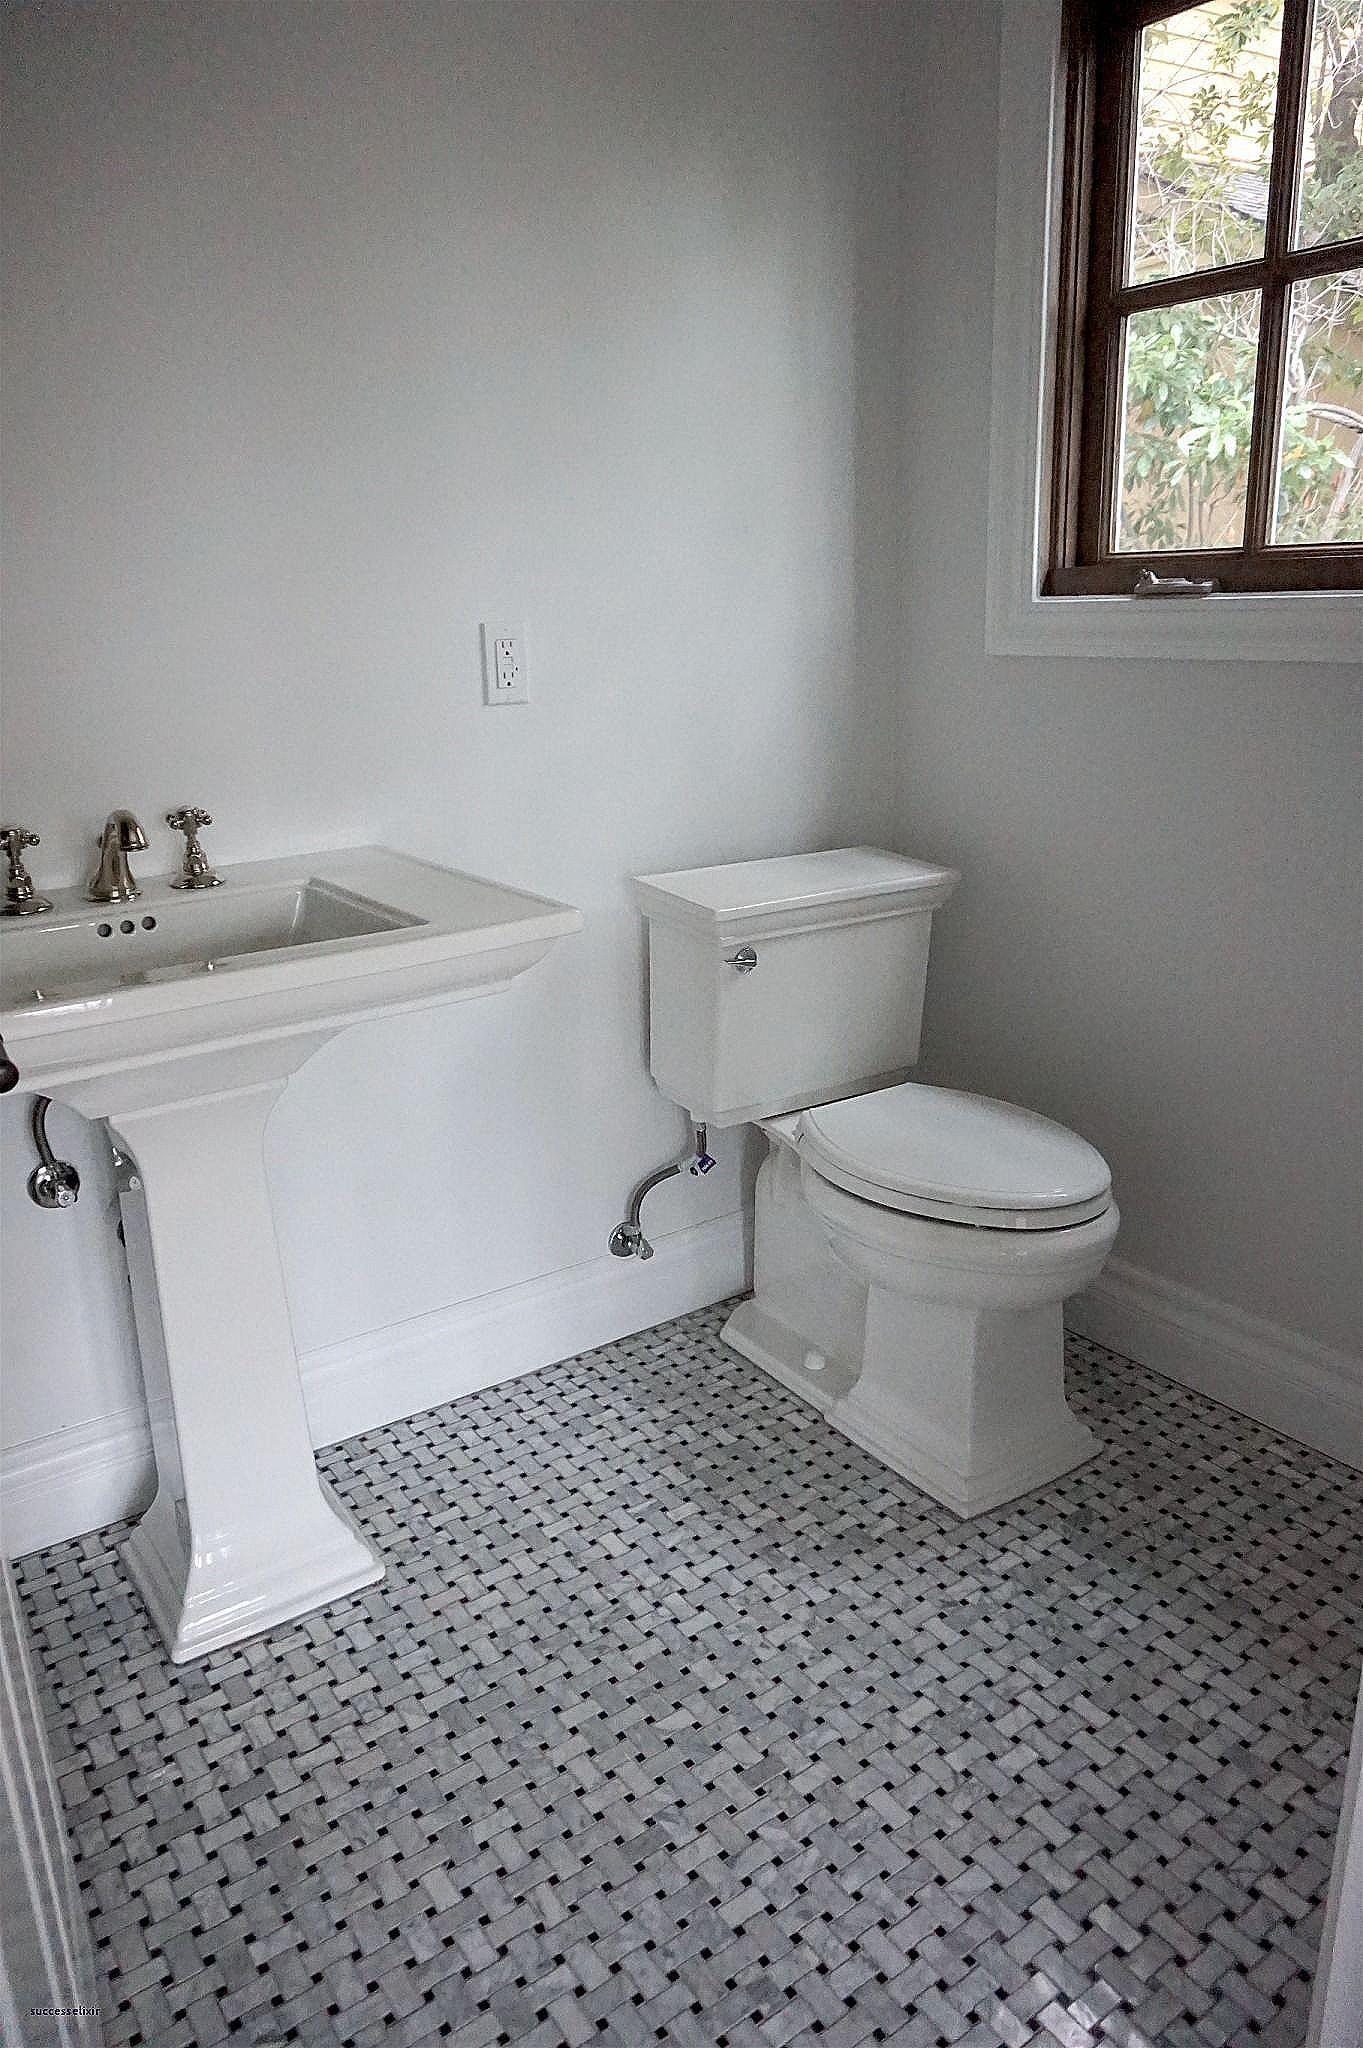 Pin By Archeonauteonlus On Bathroom Ideas Compact Bathroom Design Bathroom Renovation Cost Bathroom Cost